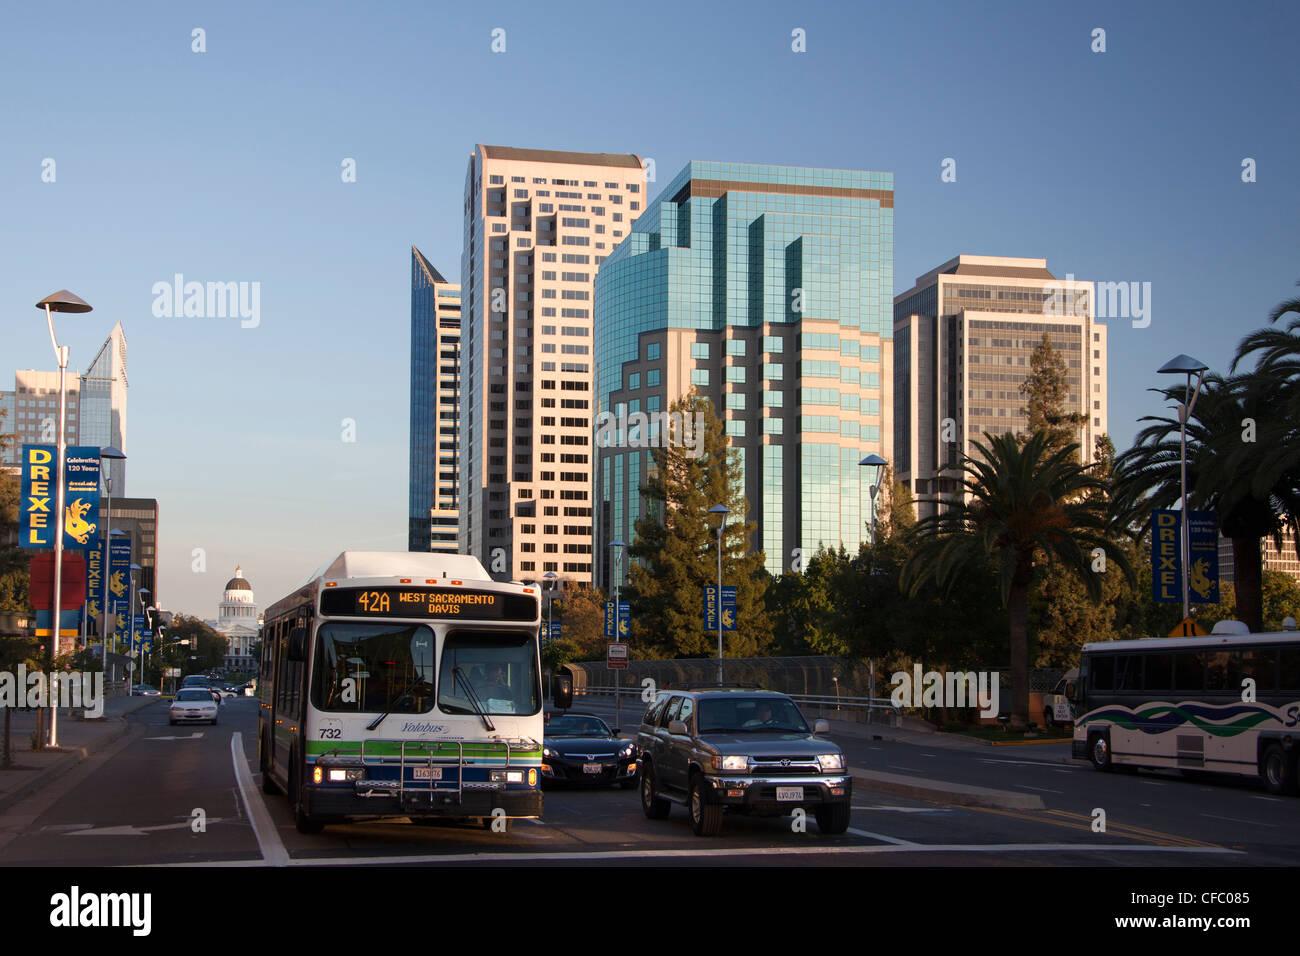 USA, USA, Amerika, Kalifornien, Sacramento, Stadt, Capitol Mall, Bus, Capitol, Skyline, touristische Stockbild